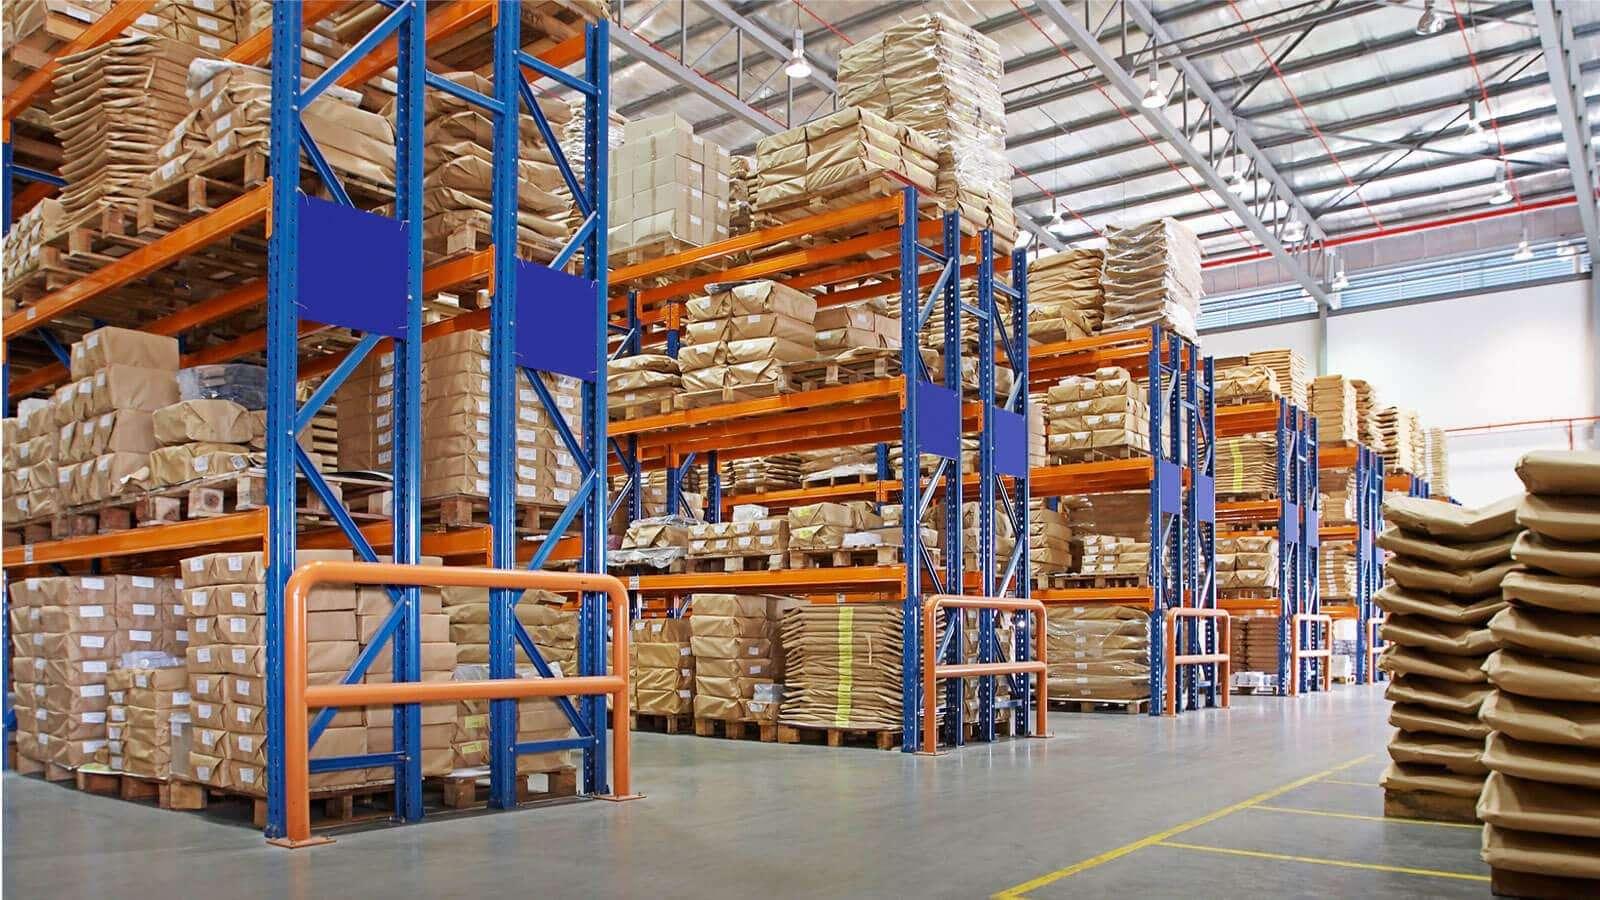 Warehouse Fulfilment